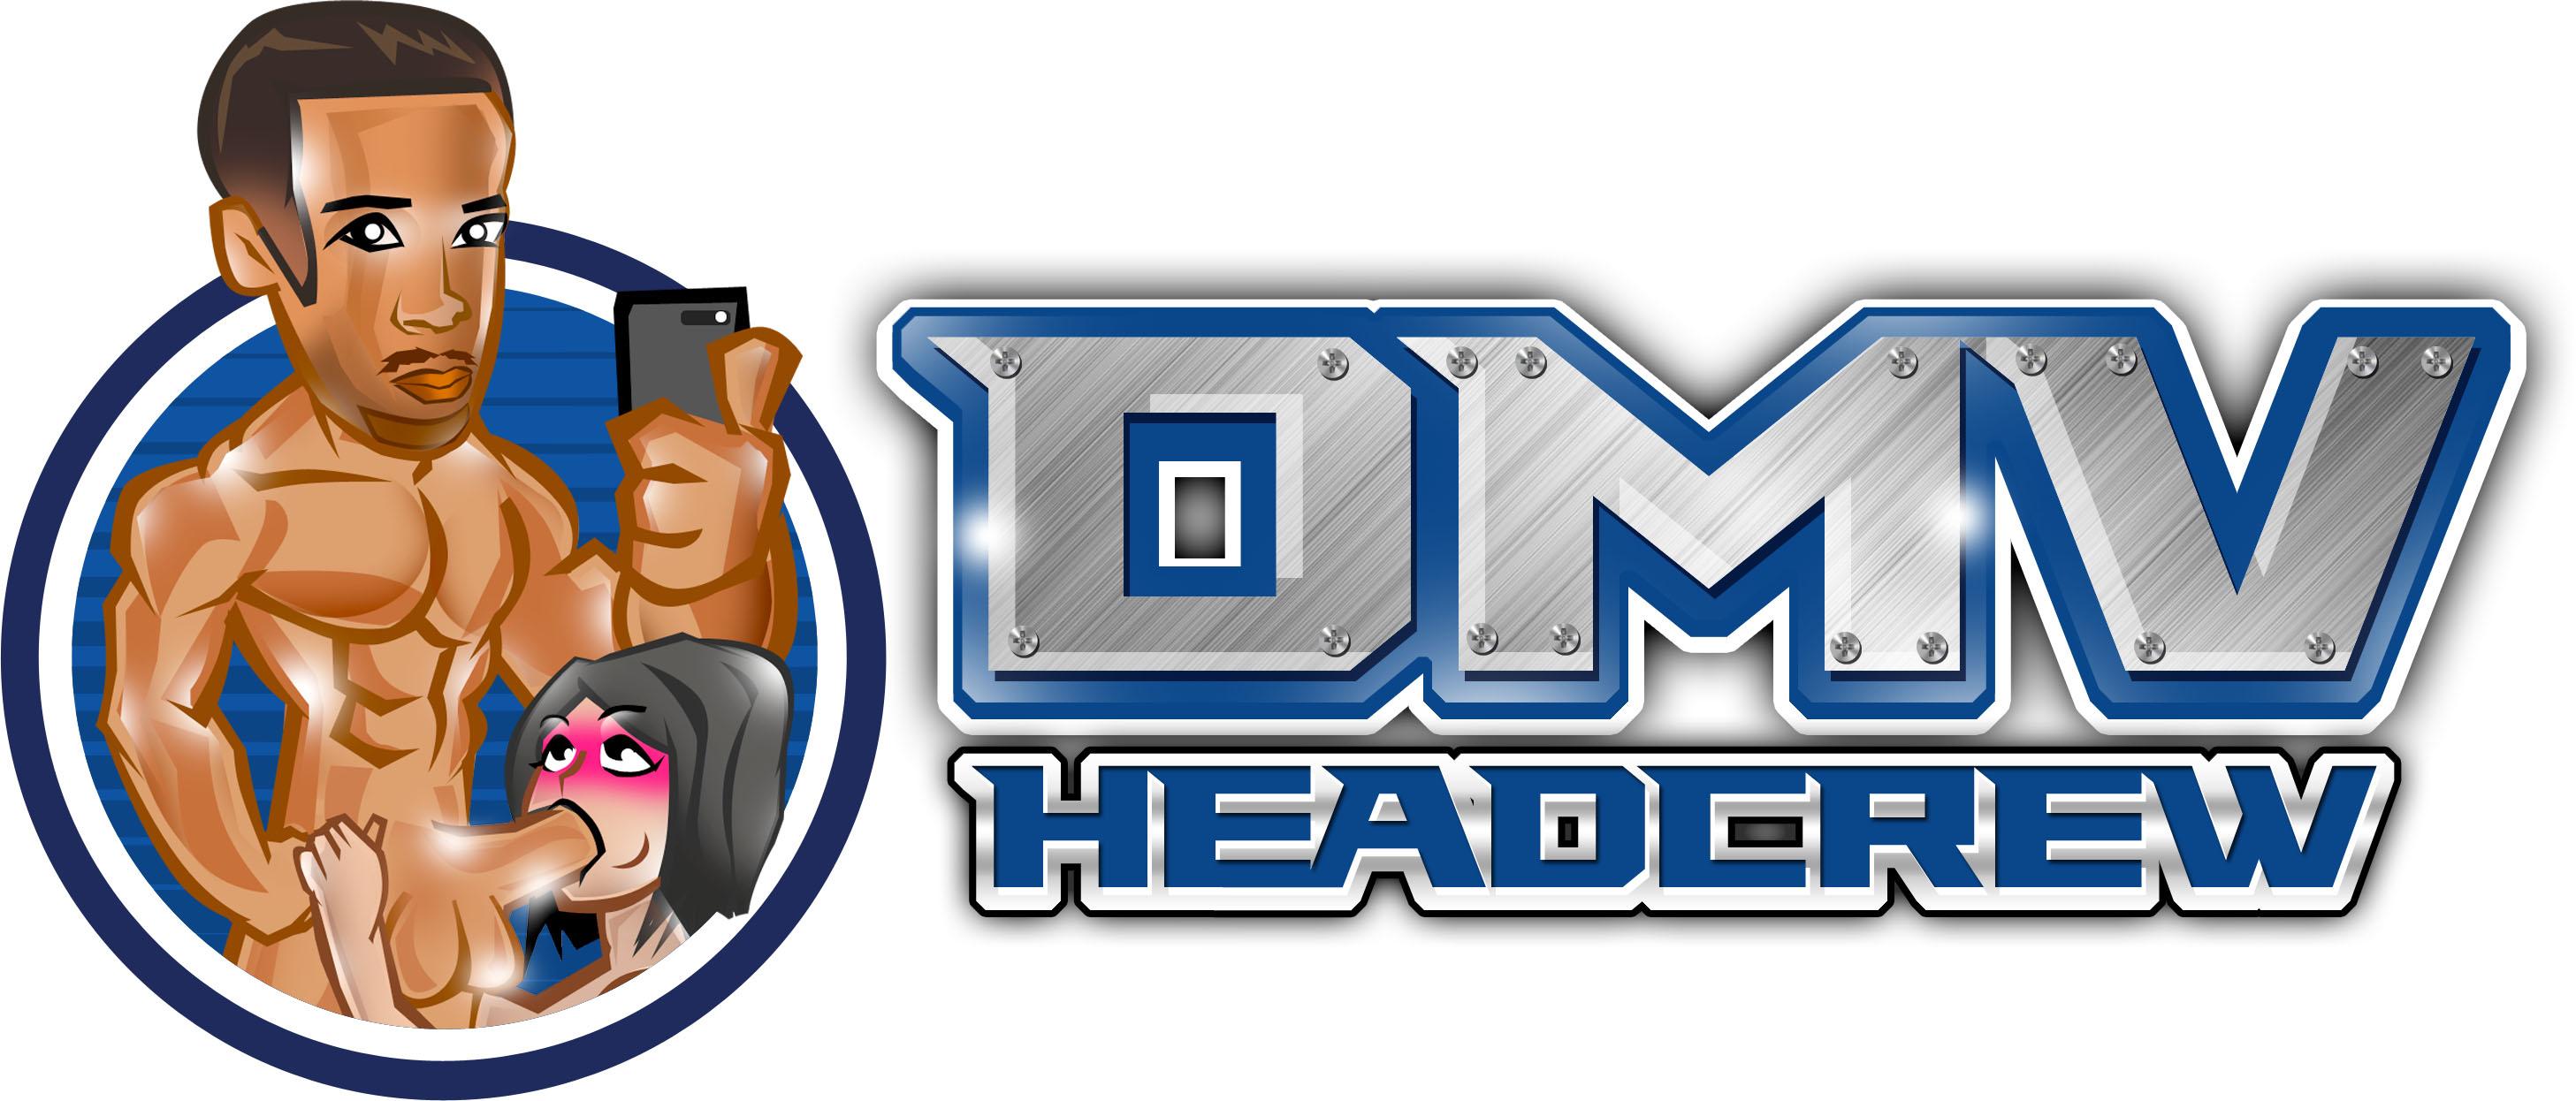 DMVHEADCREW